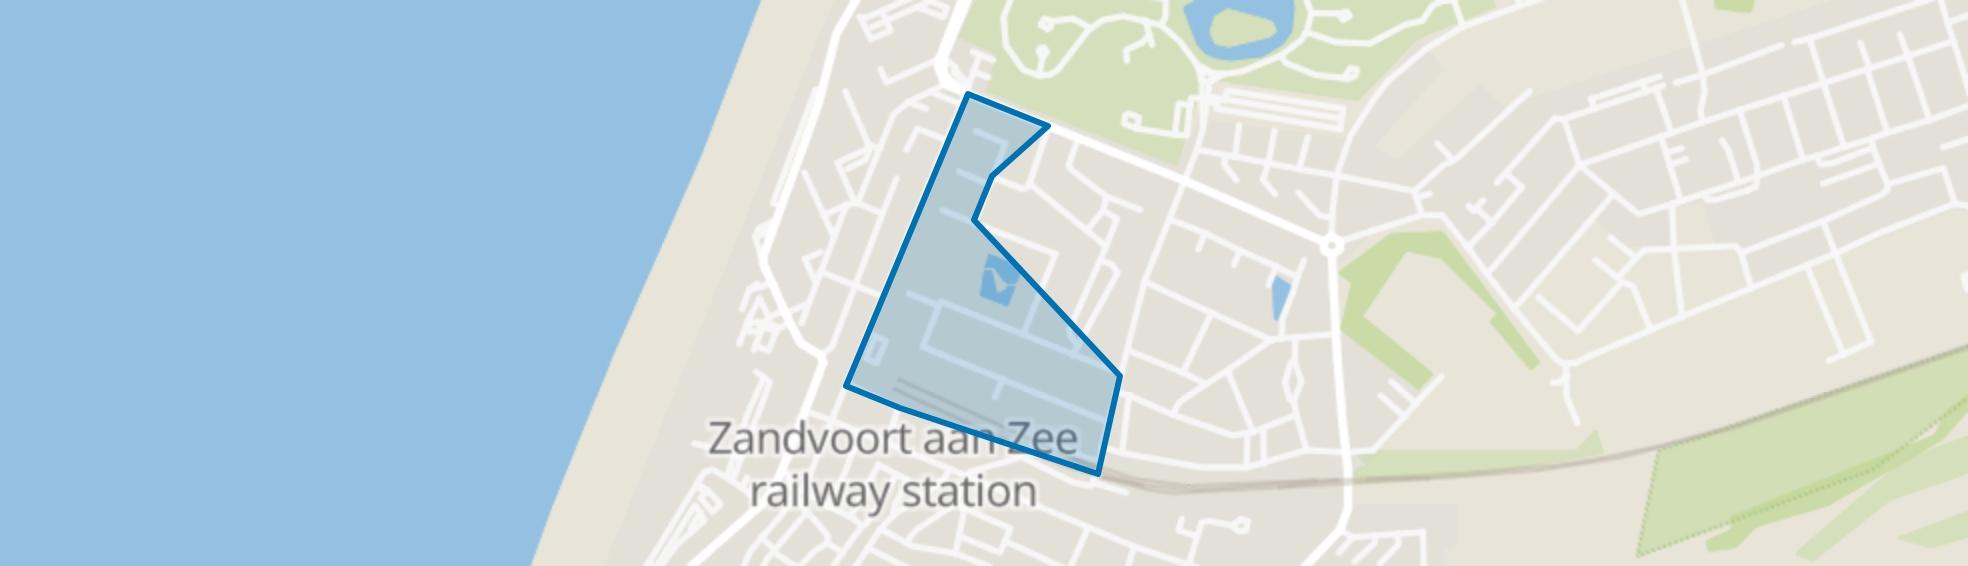 Stations omgeving, Zandvoort map